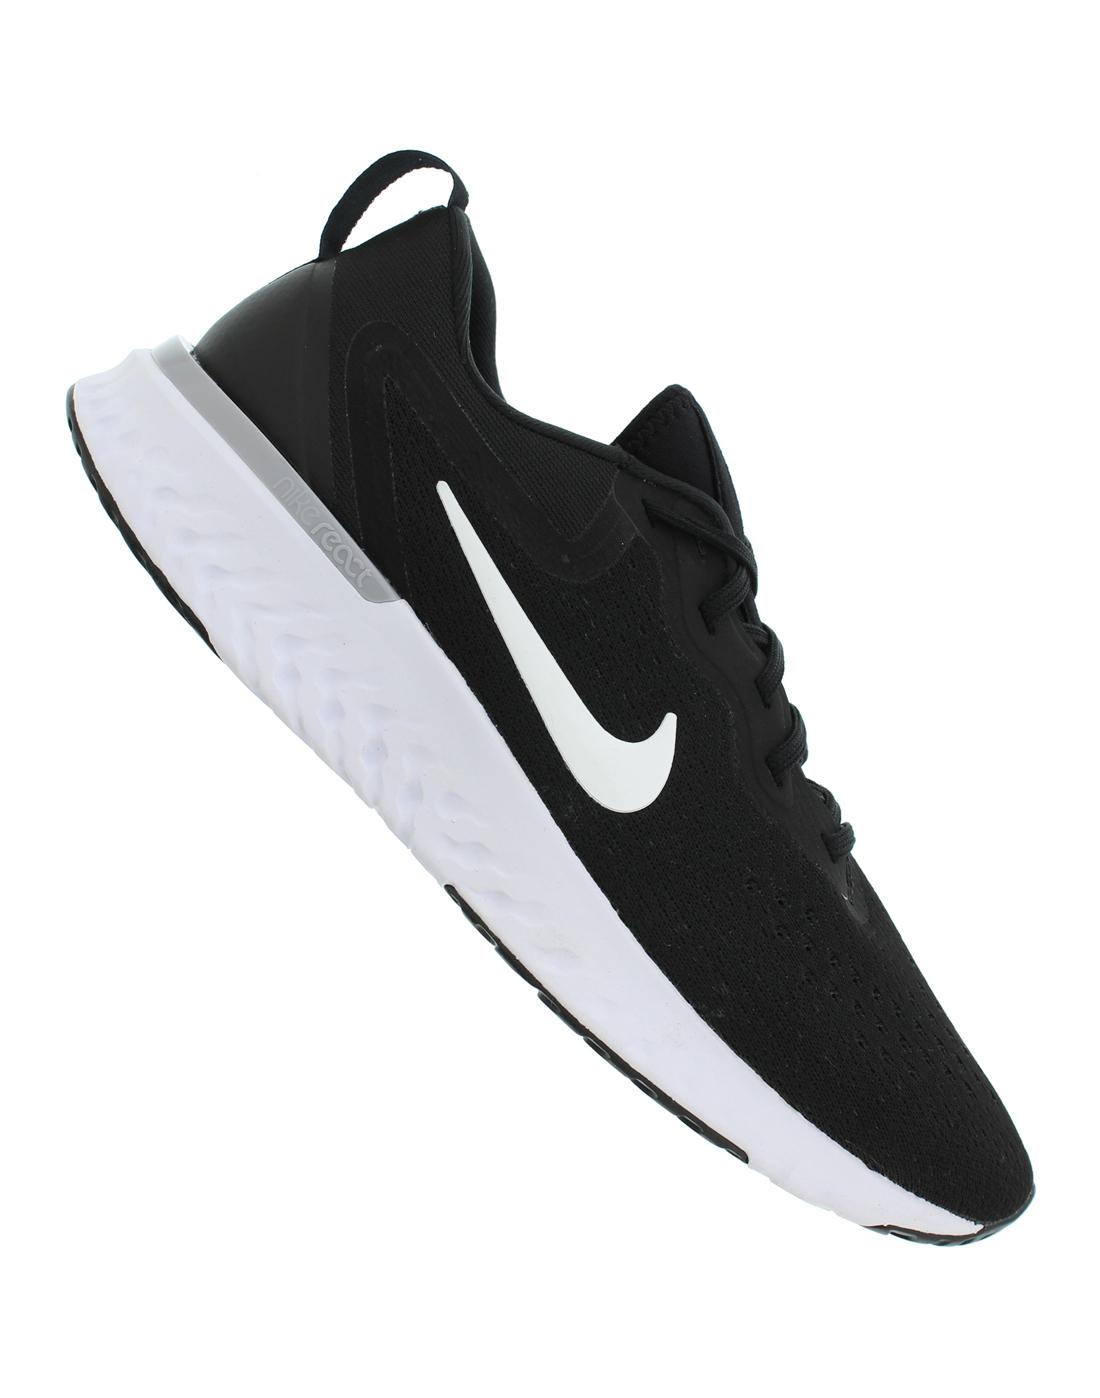 8749dcf42937 Nike Womens Odyssey React